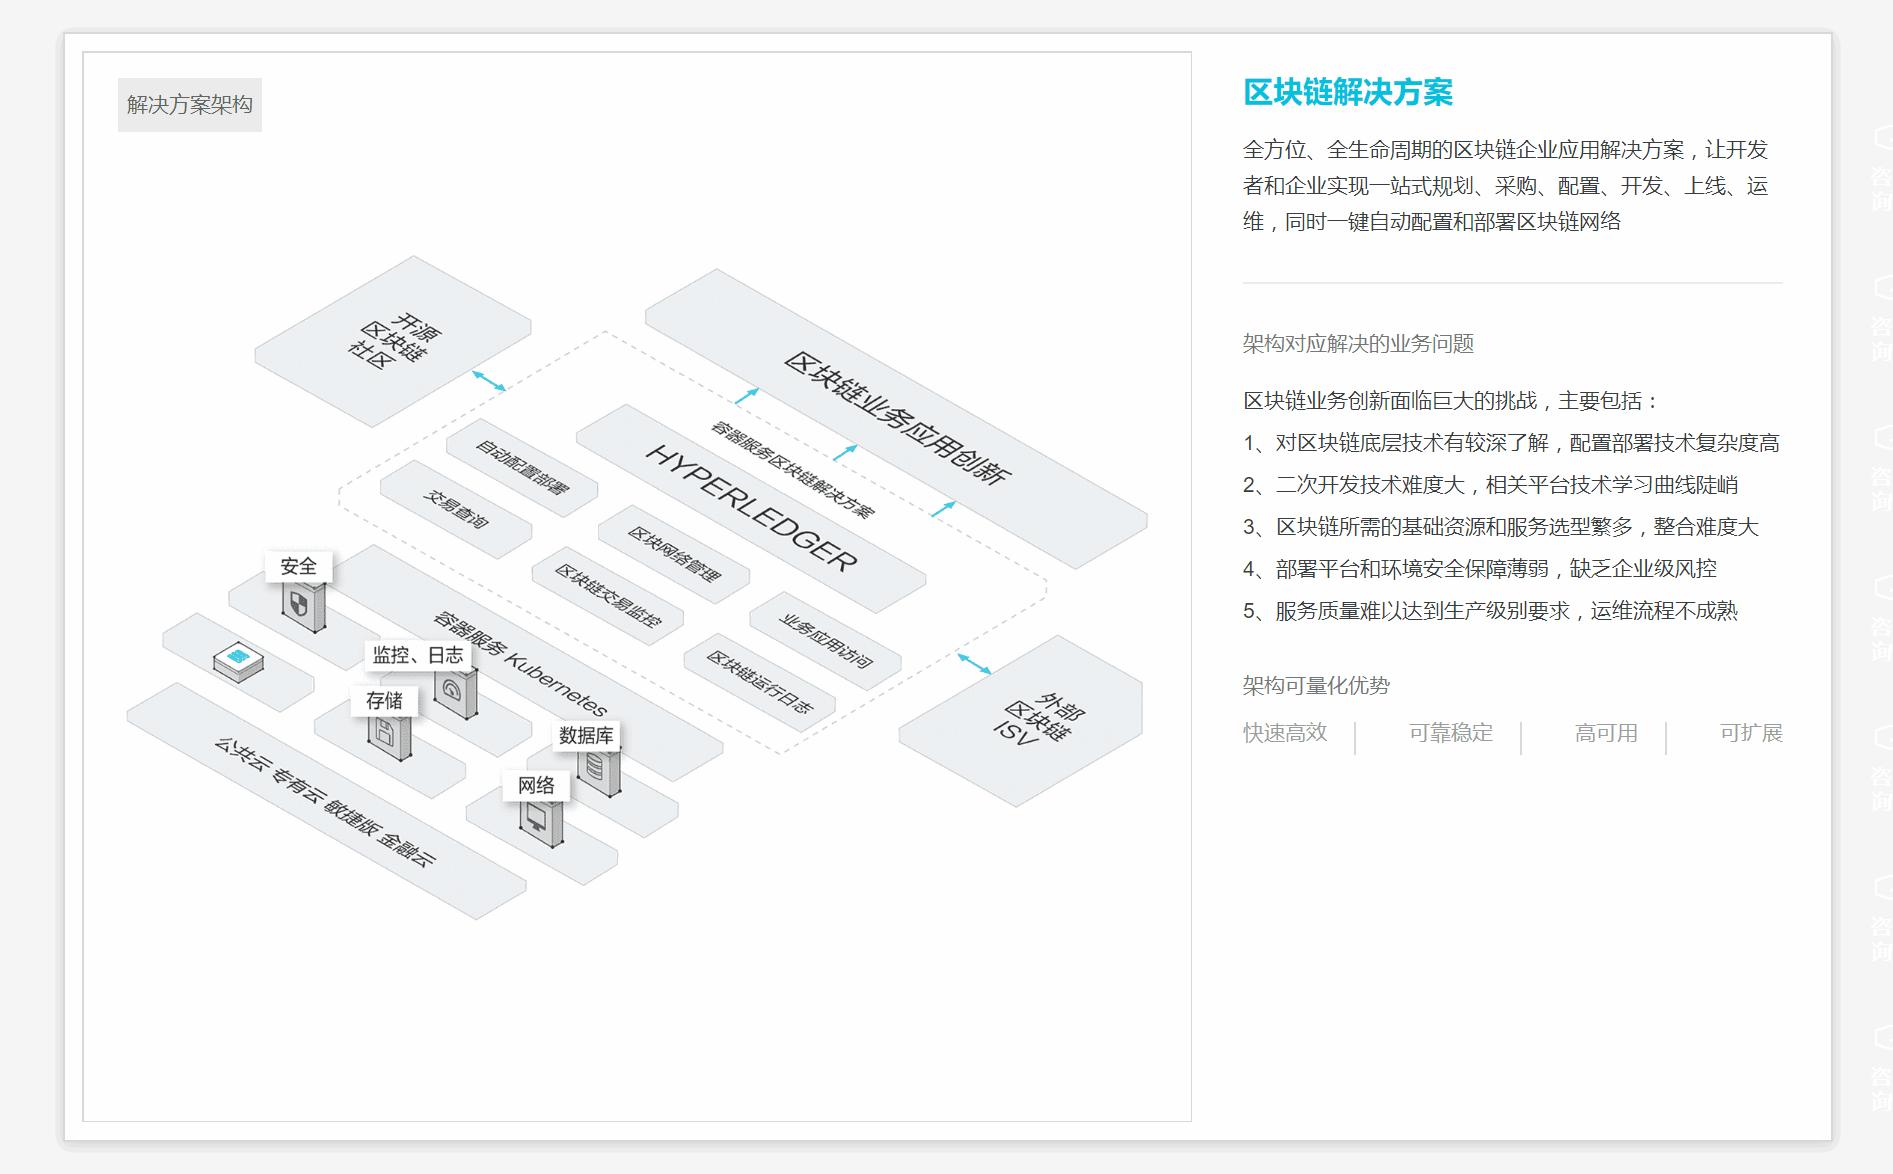 2018-07-26_003515_看图王.png